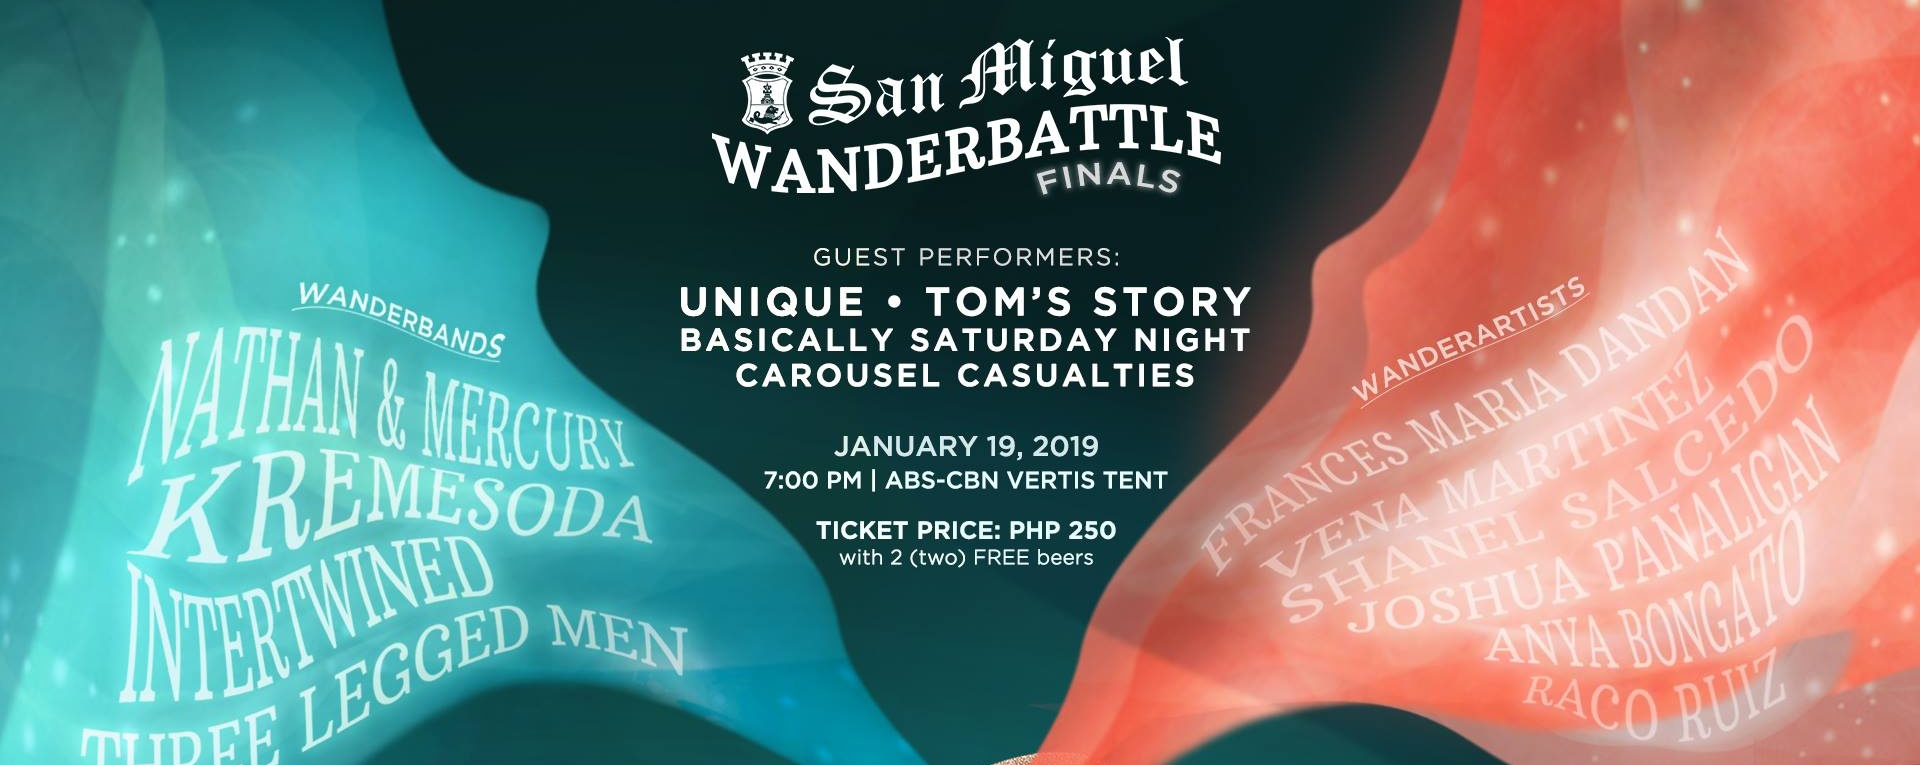 San Miguel Wanderbattle: Finals